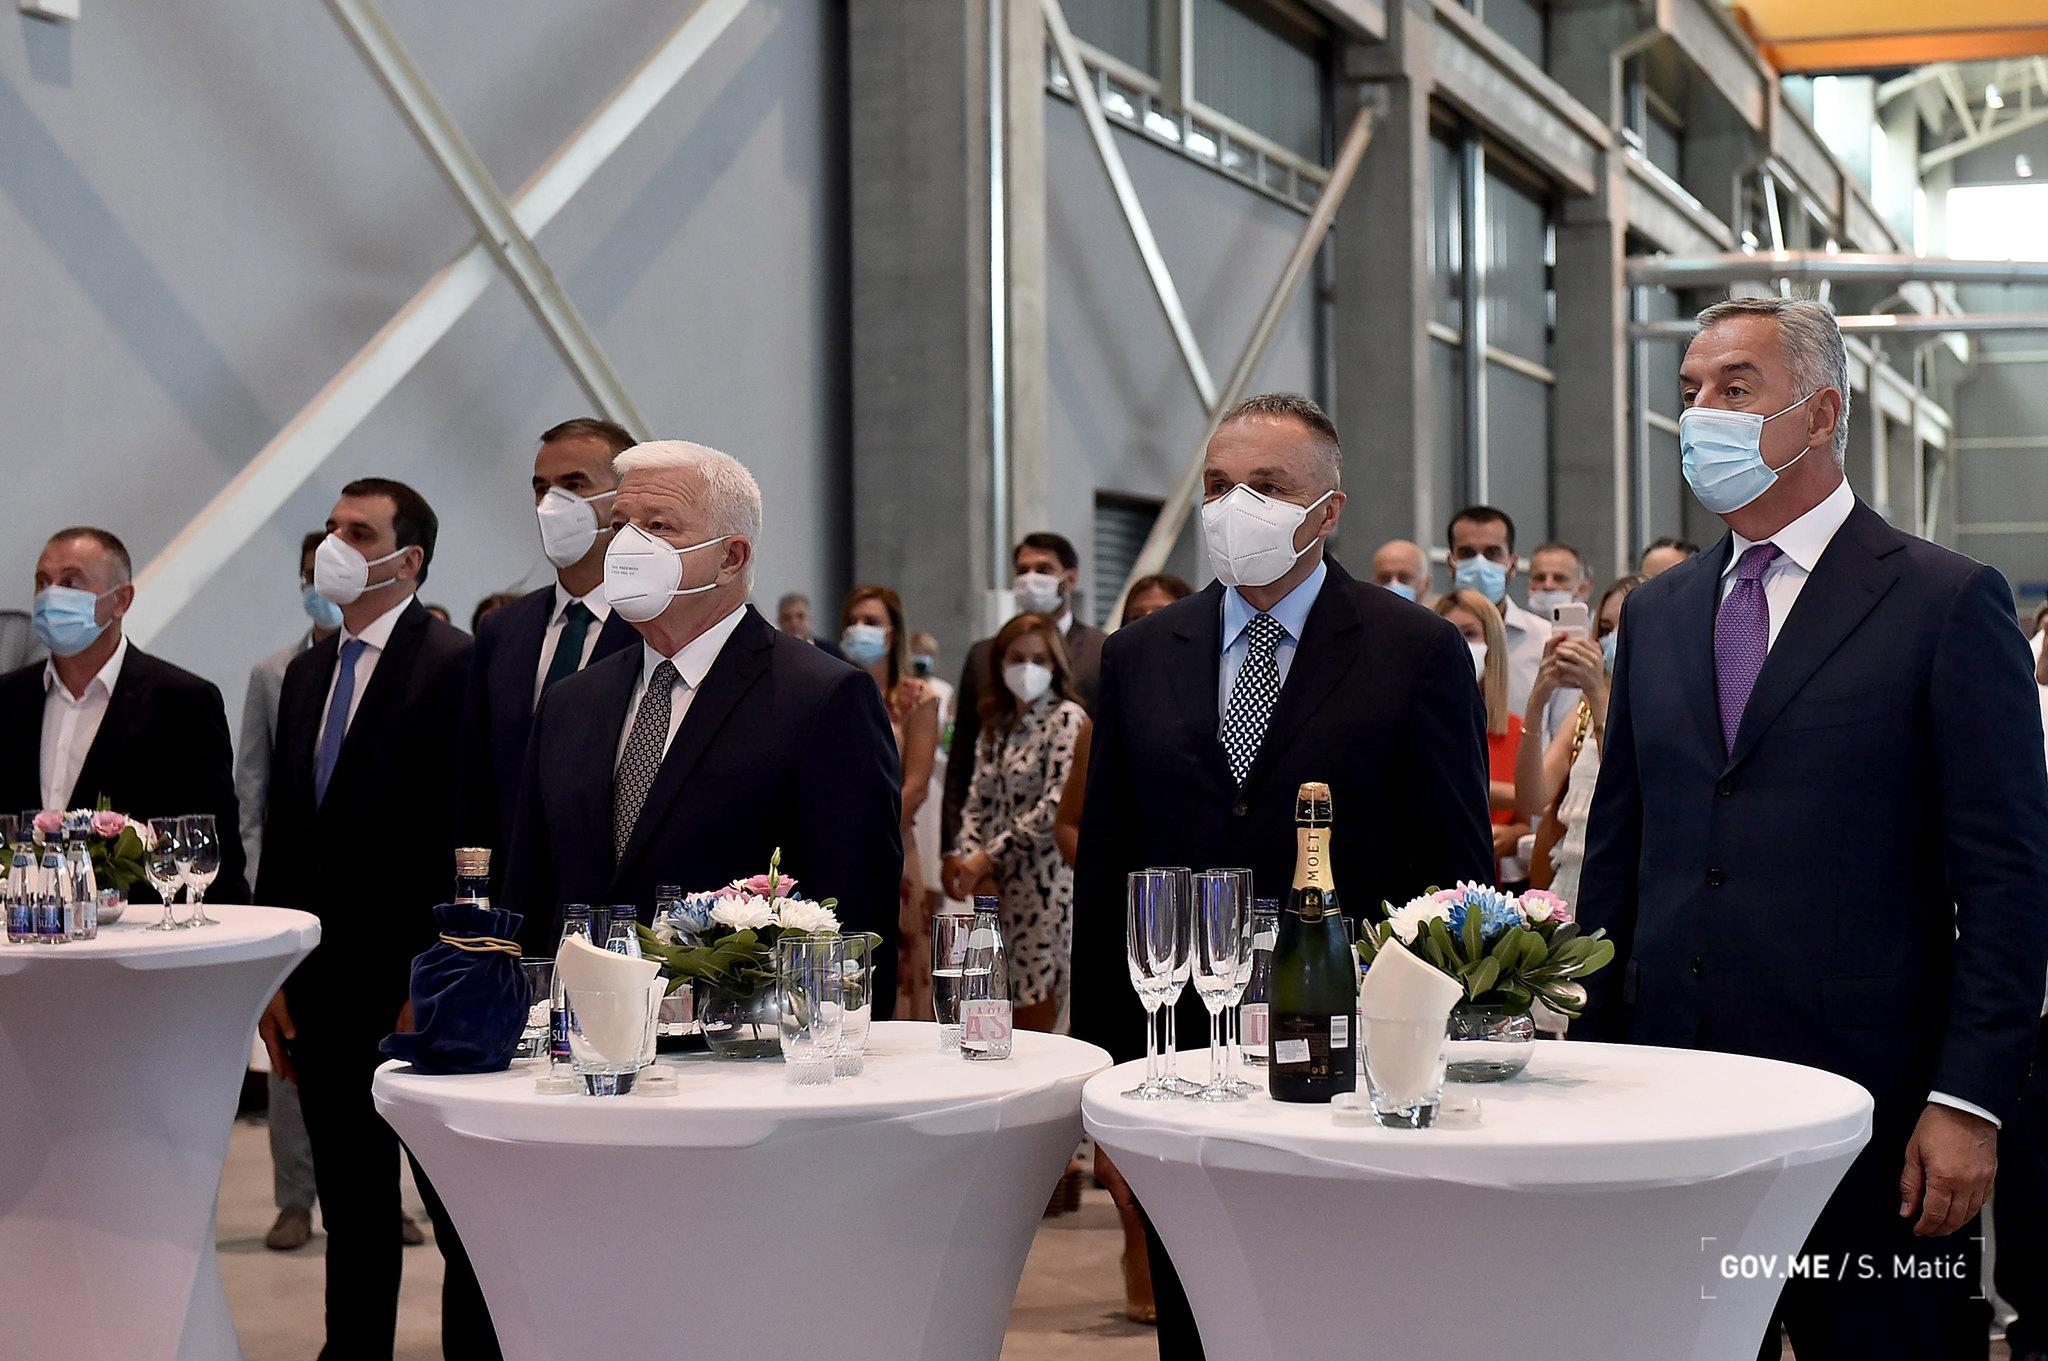 UNIPROM: opening of aluminium billets factory